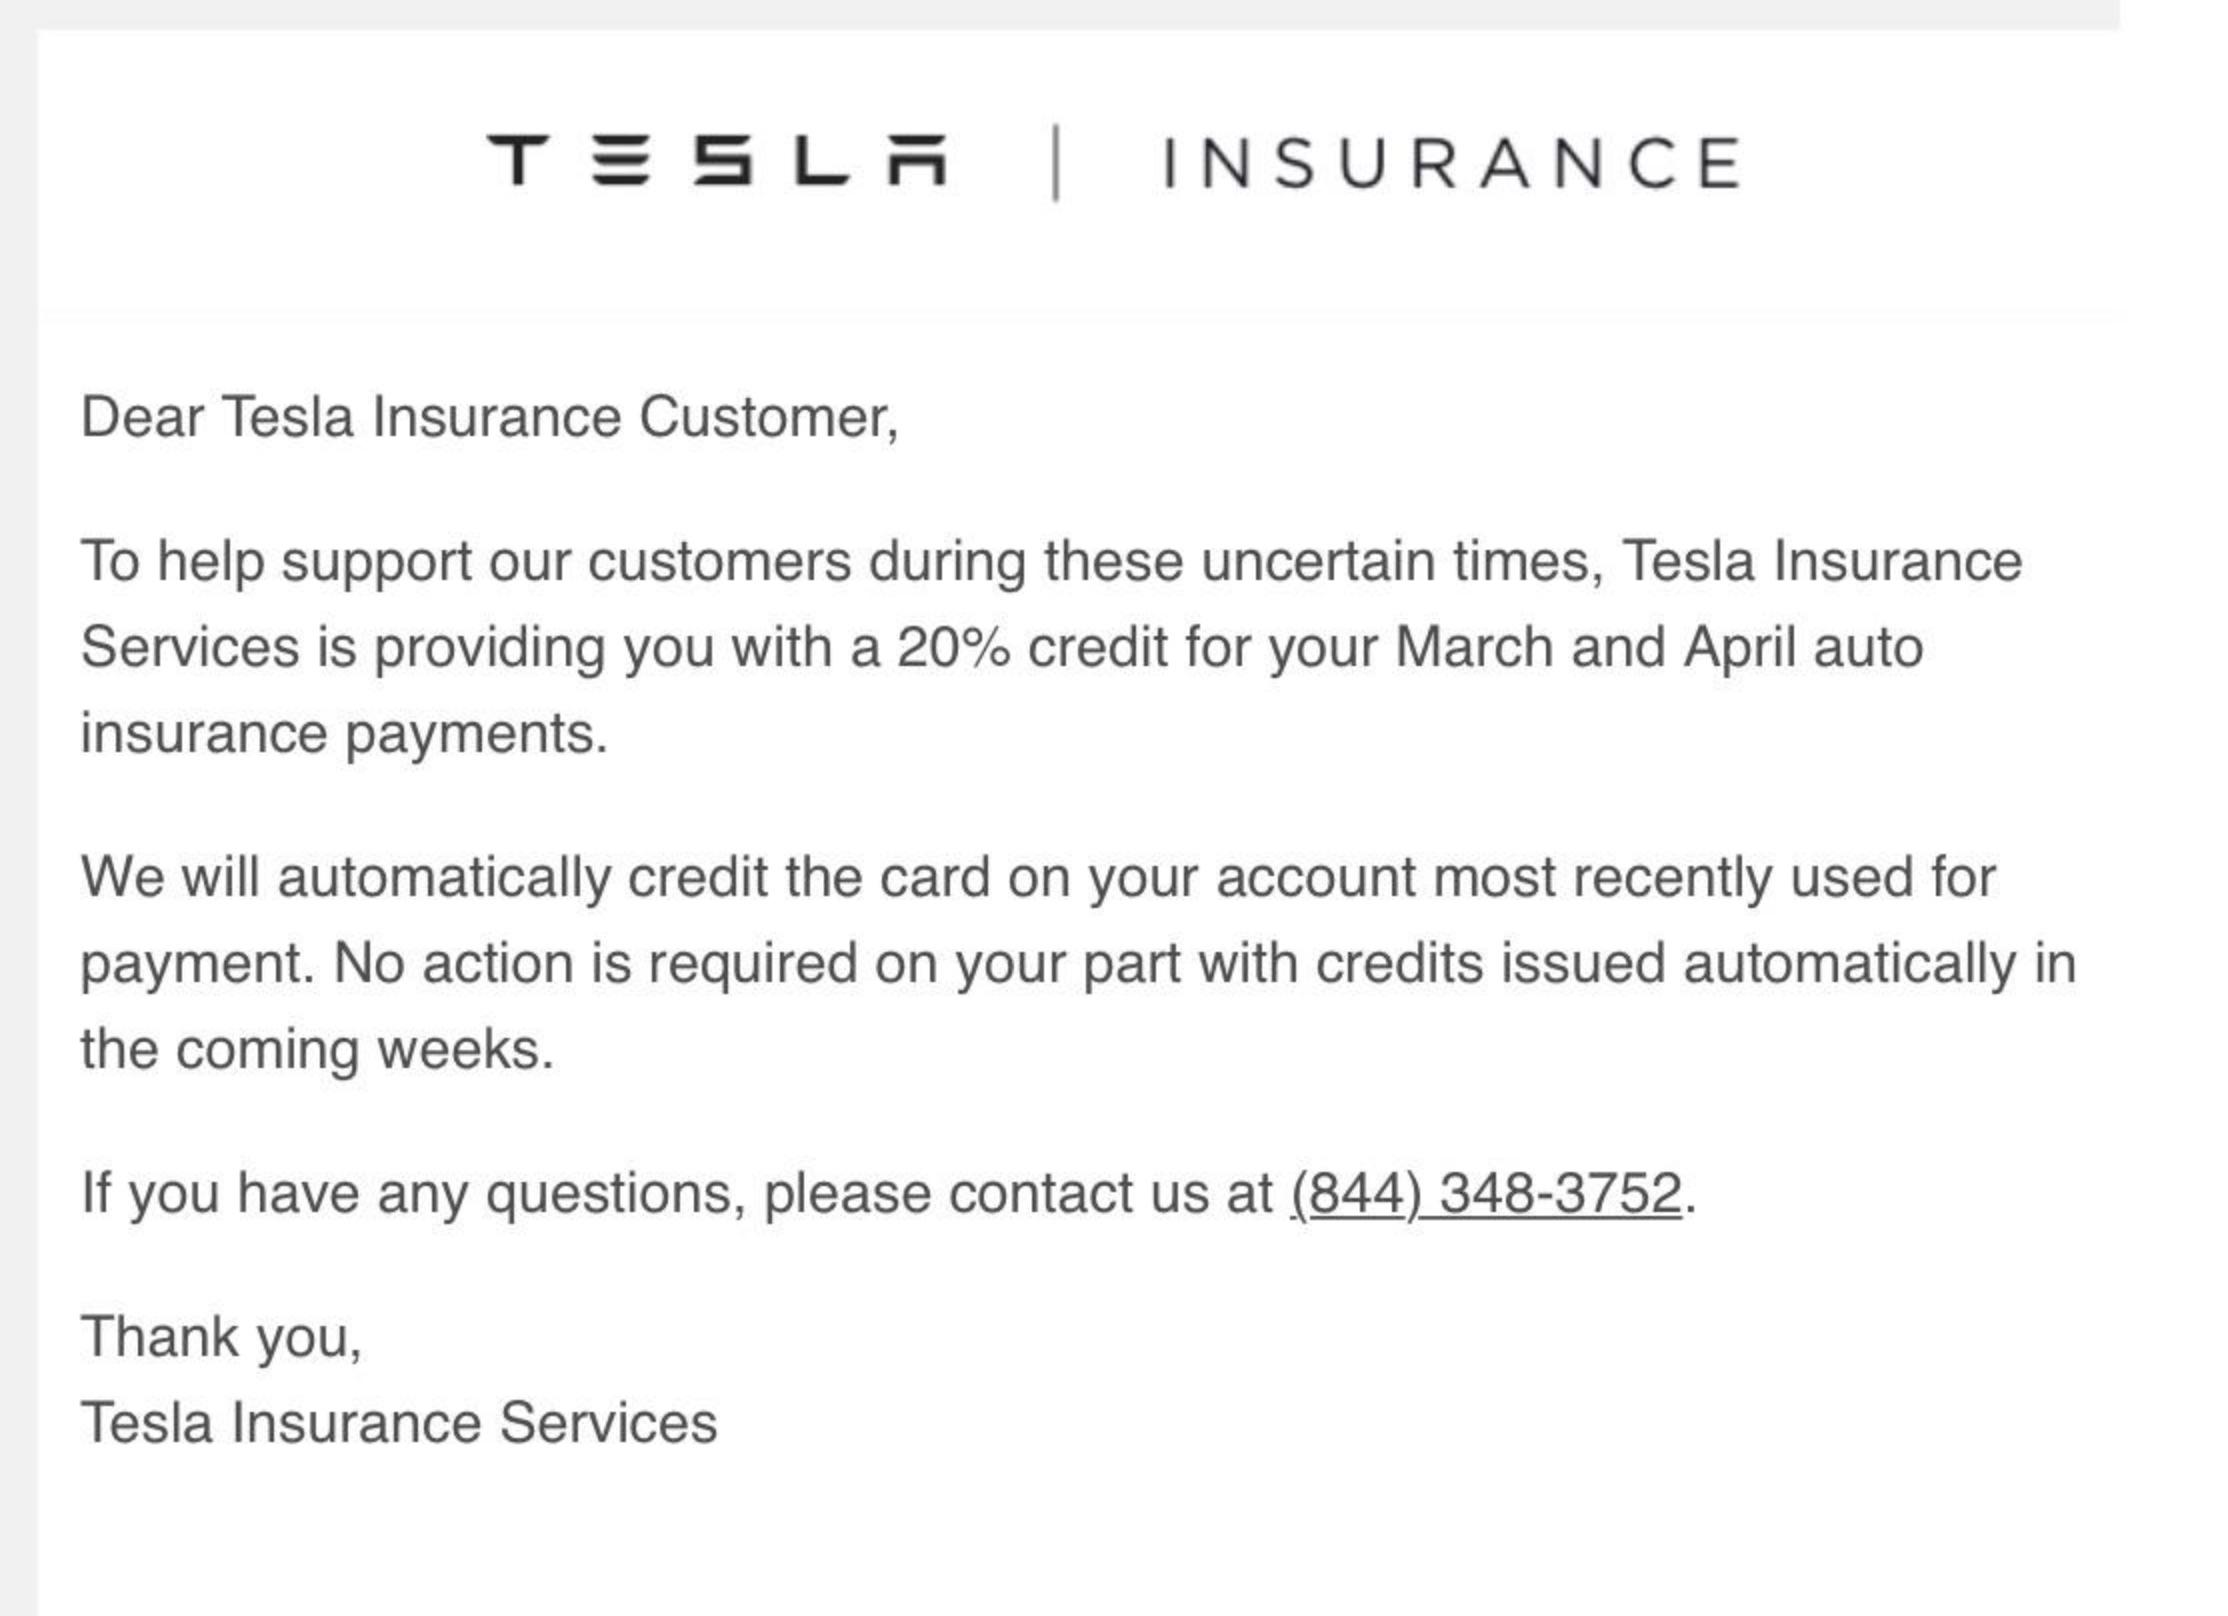 tesla-insurance-discount-covid-19